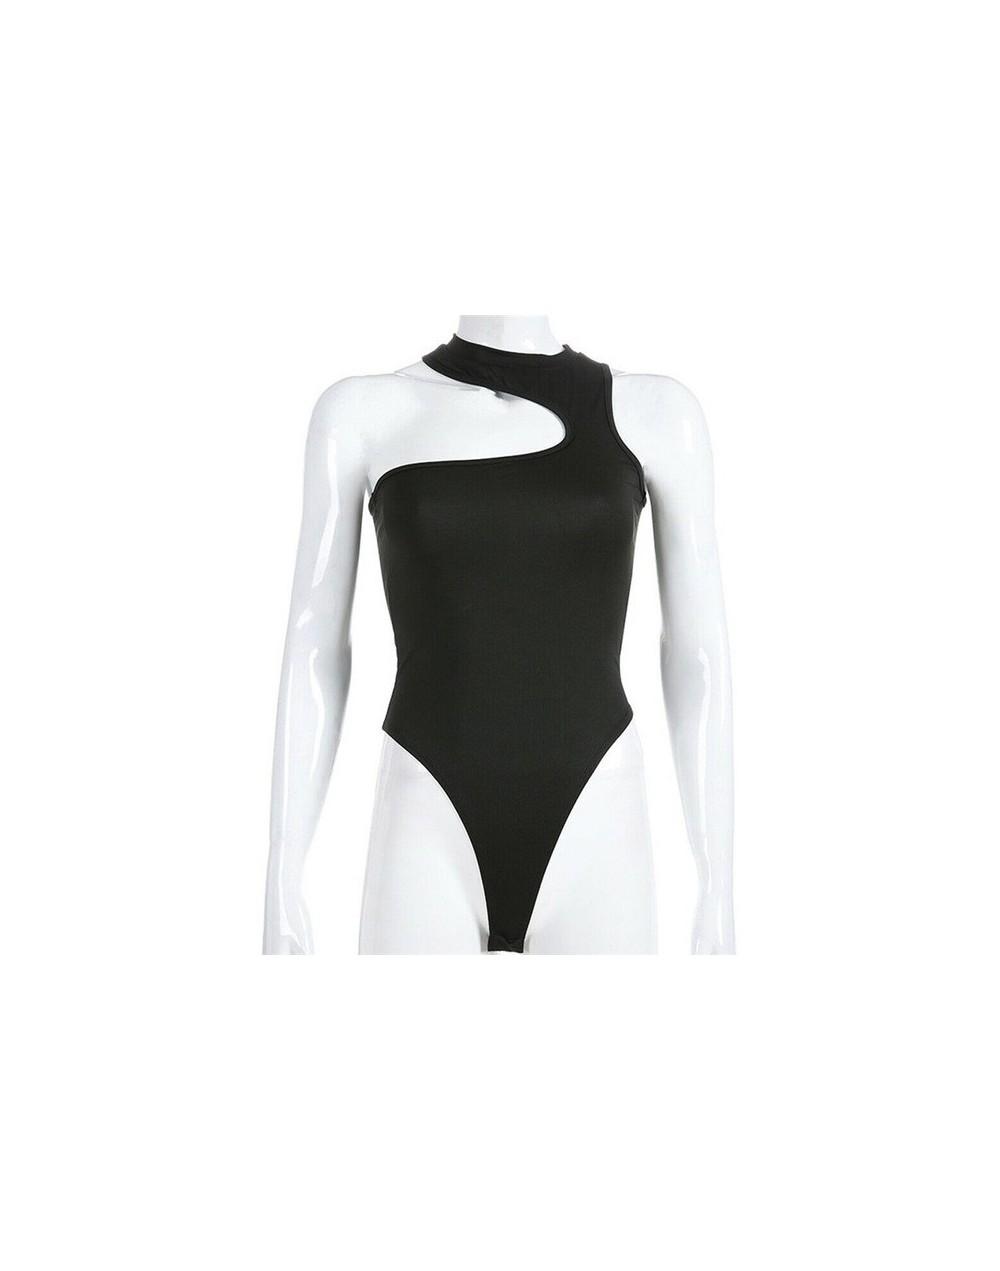 Newest Women Cotton Bodysuit Stretch Leotard Sleeveless Body Tops Lady Jumpsuit - Black - 4J4115457489-1